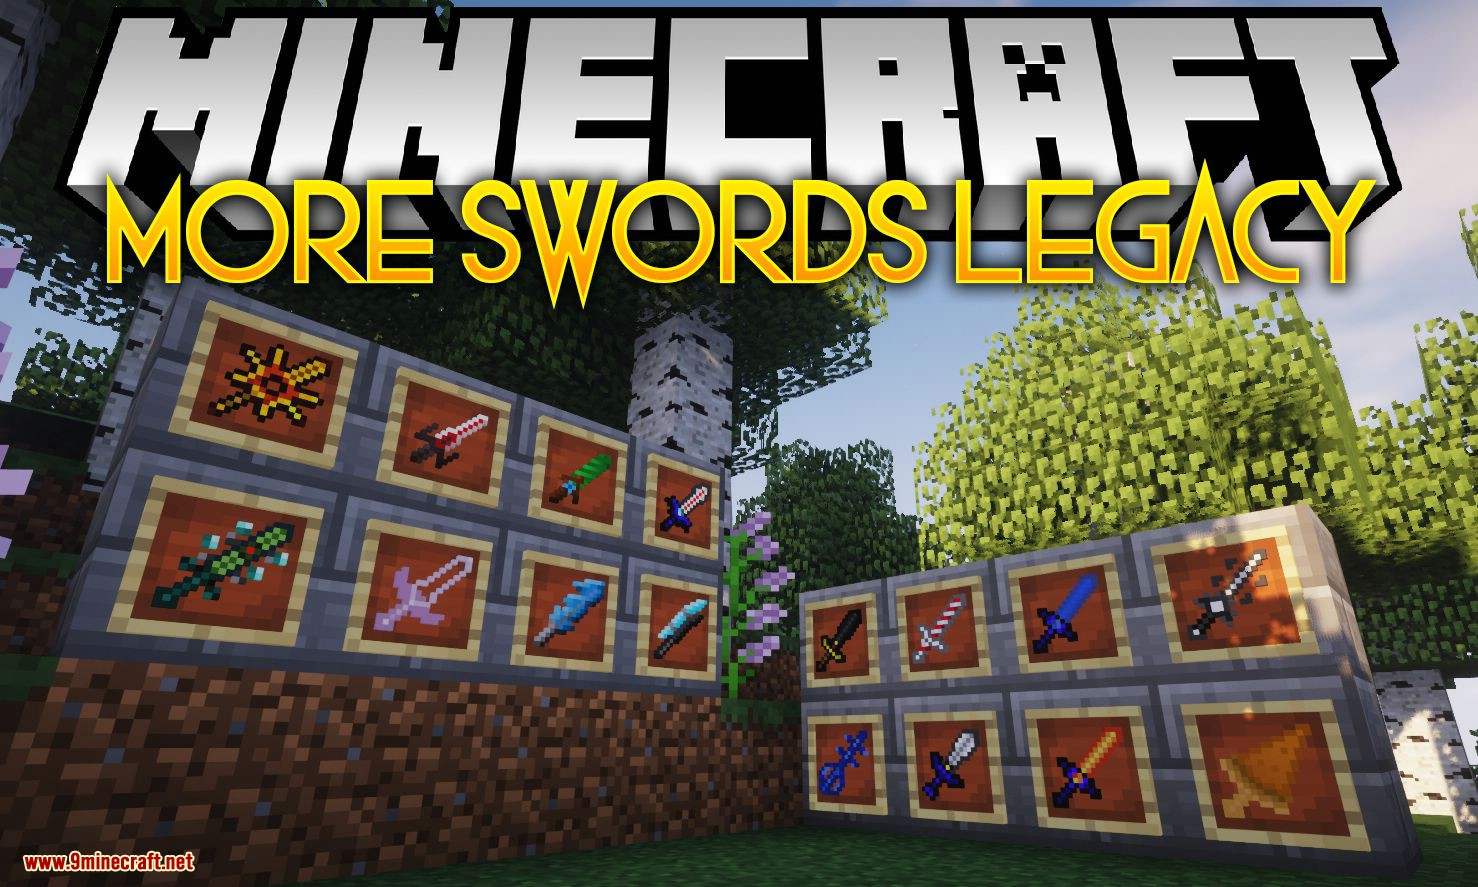 More Swords Legacy mod for minecraft logo